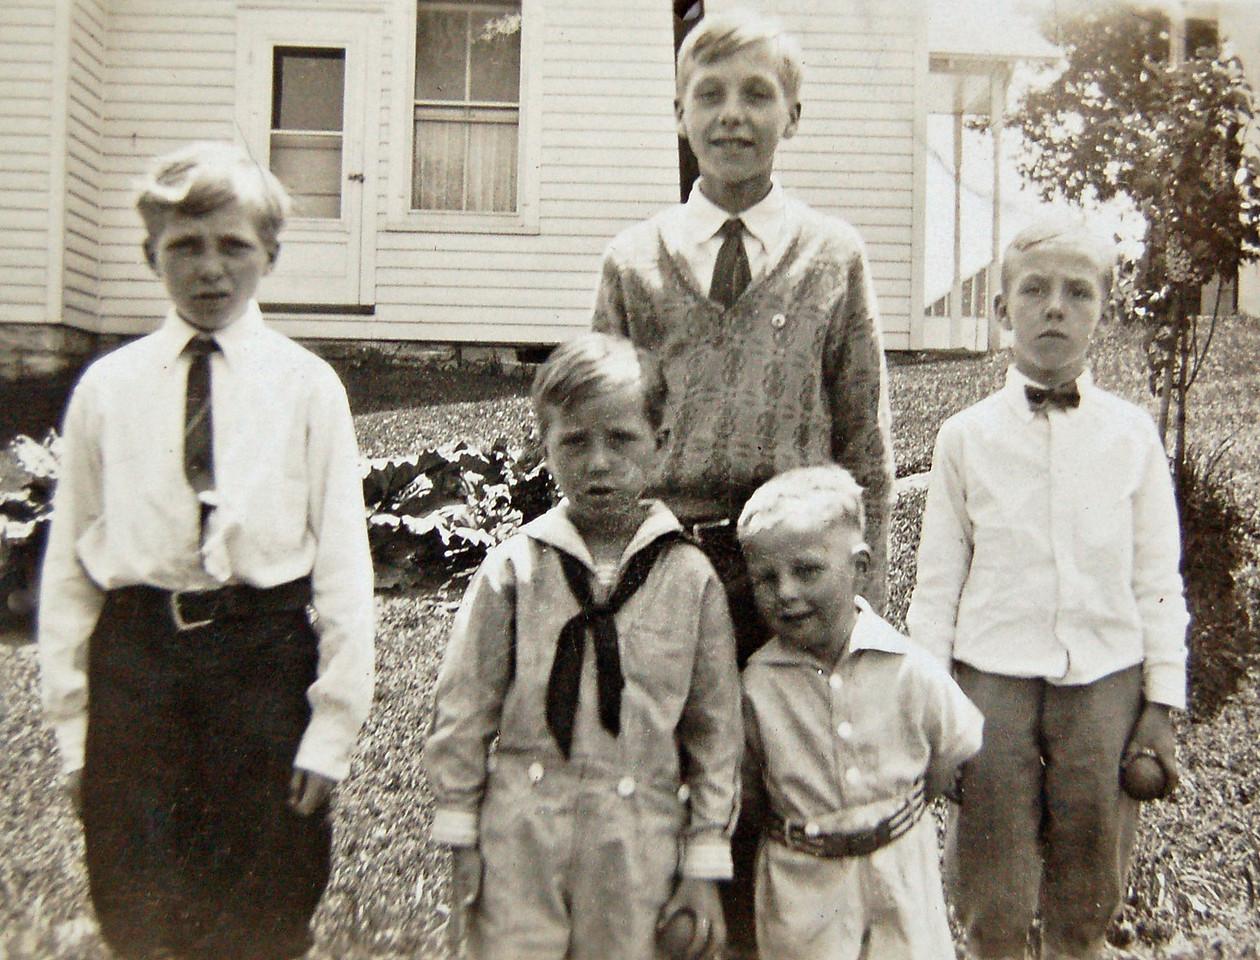 Rigdon Boys: Charles, Bill, Bob, Pete & John